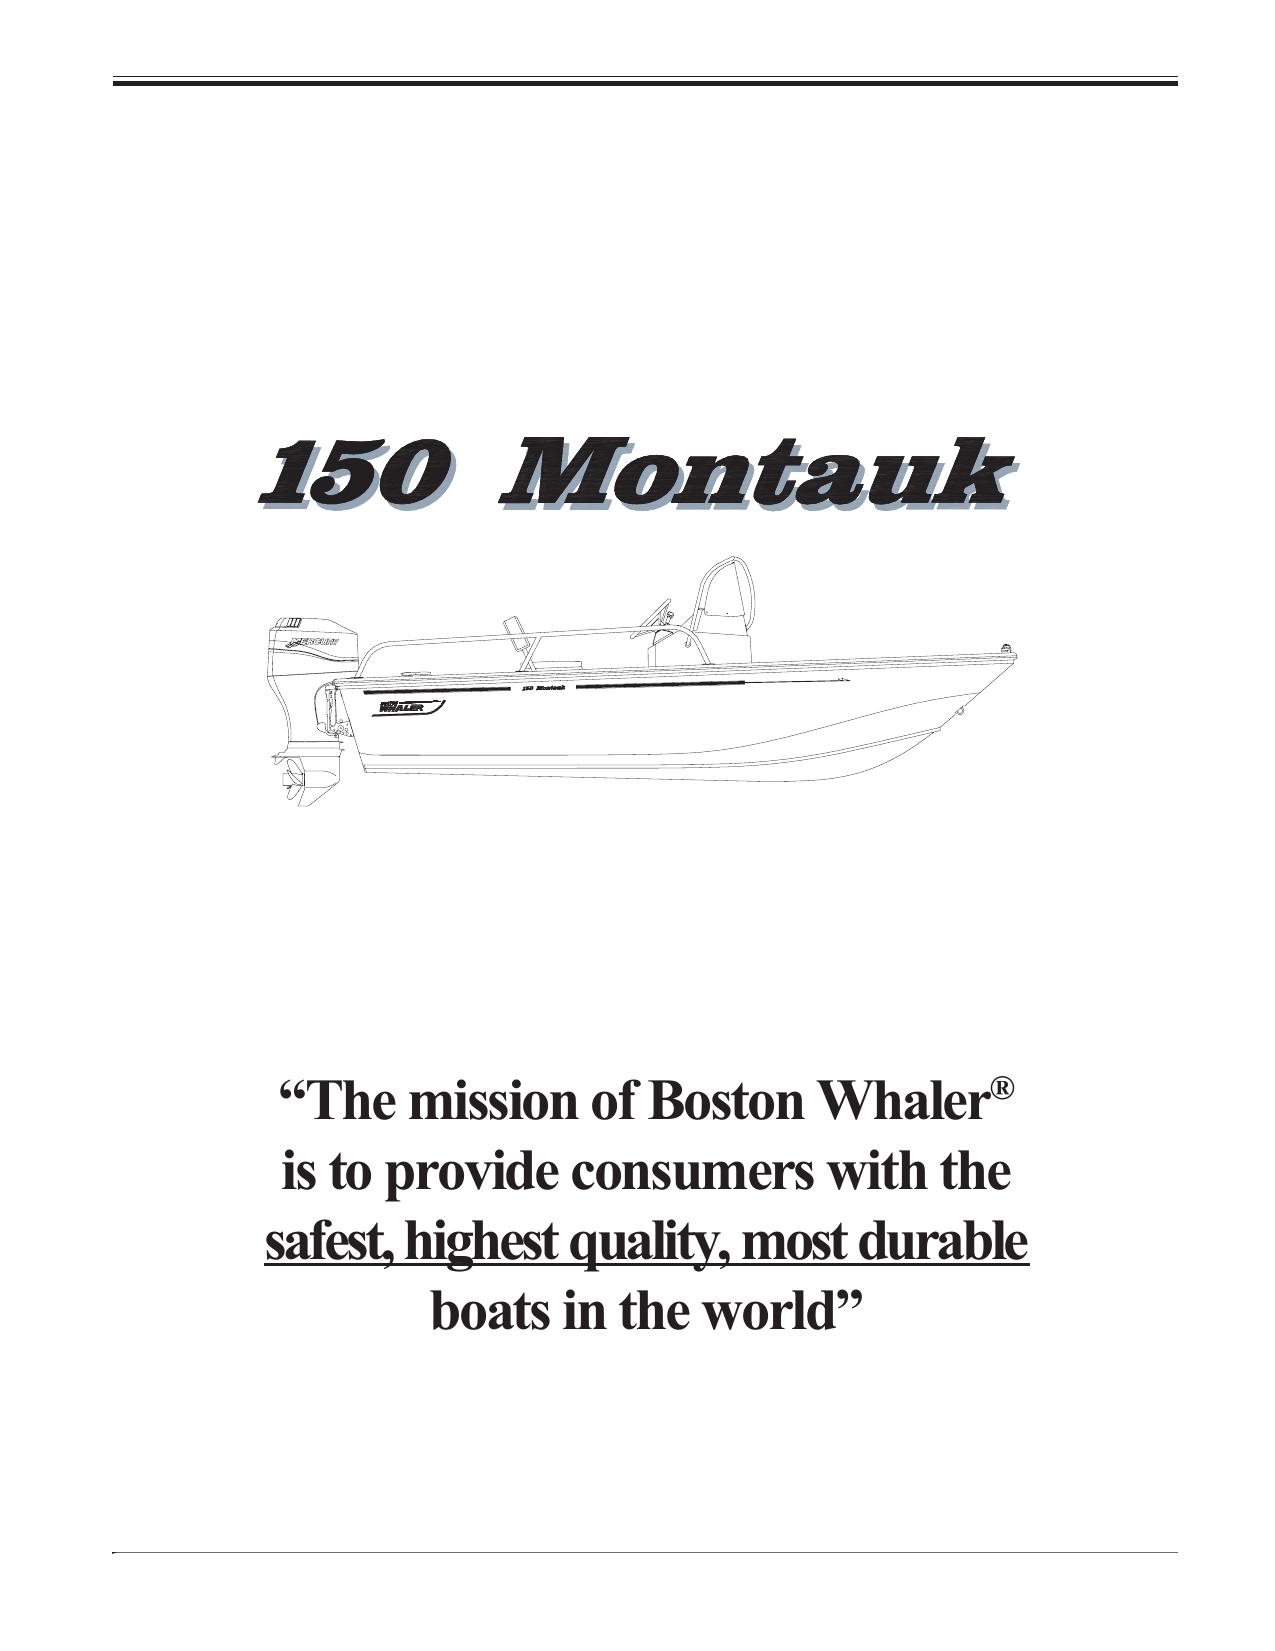 150MT_Care.pdf. Boston Whaler 150 Montauk | 150MT_Care.pdf